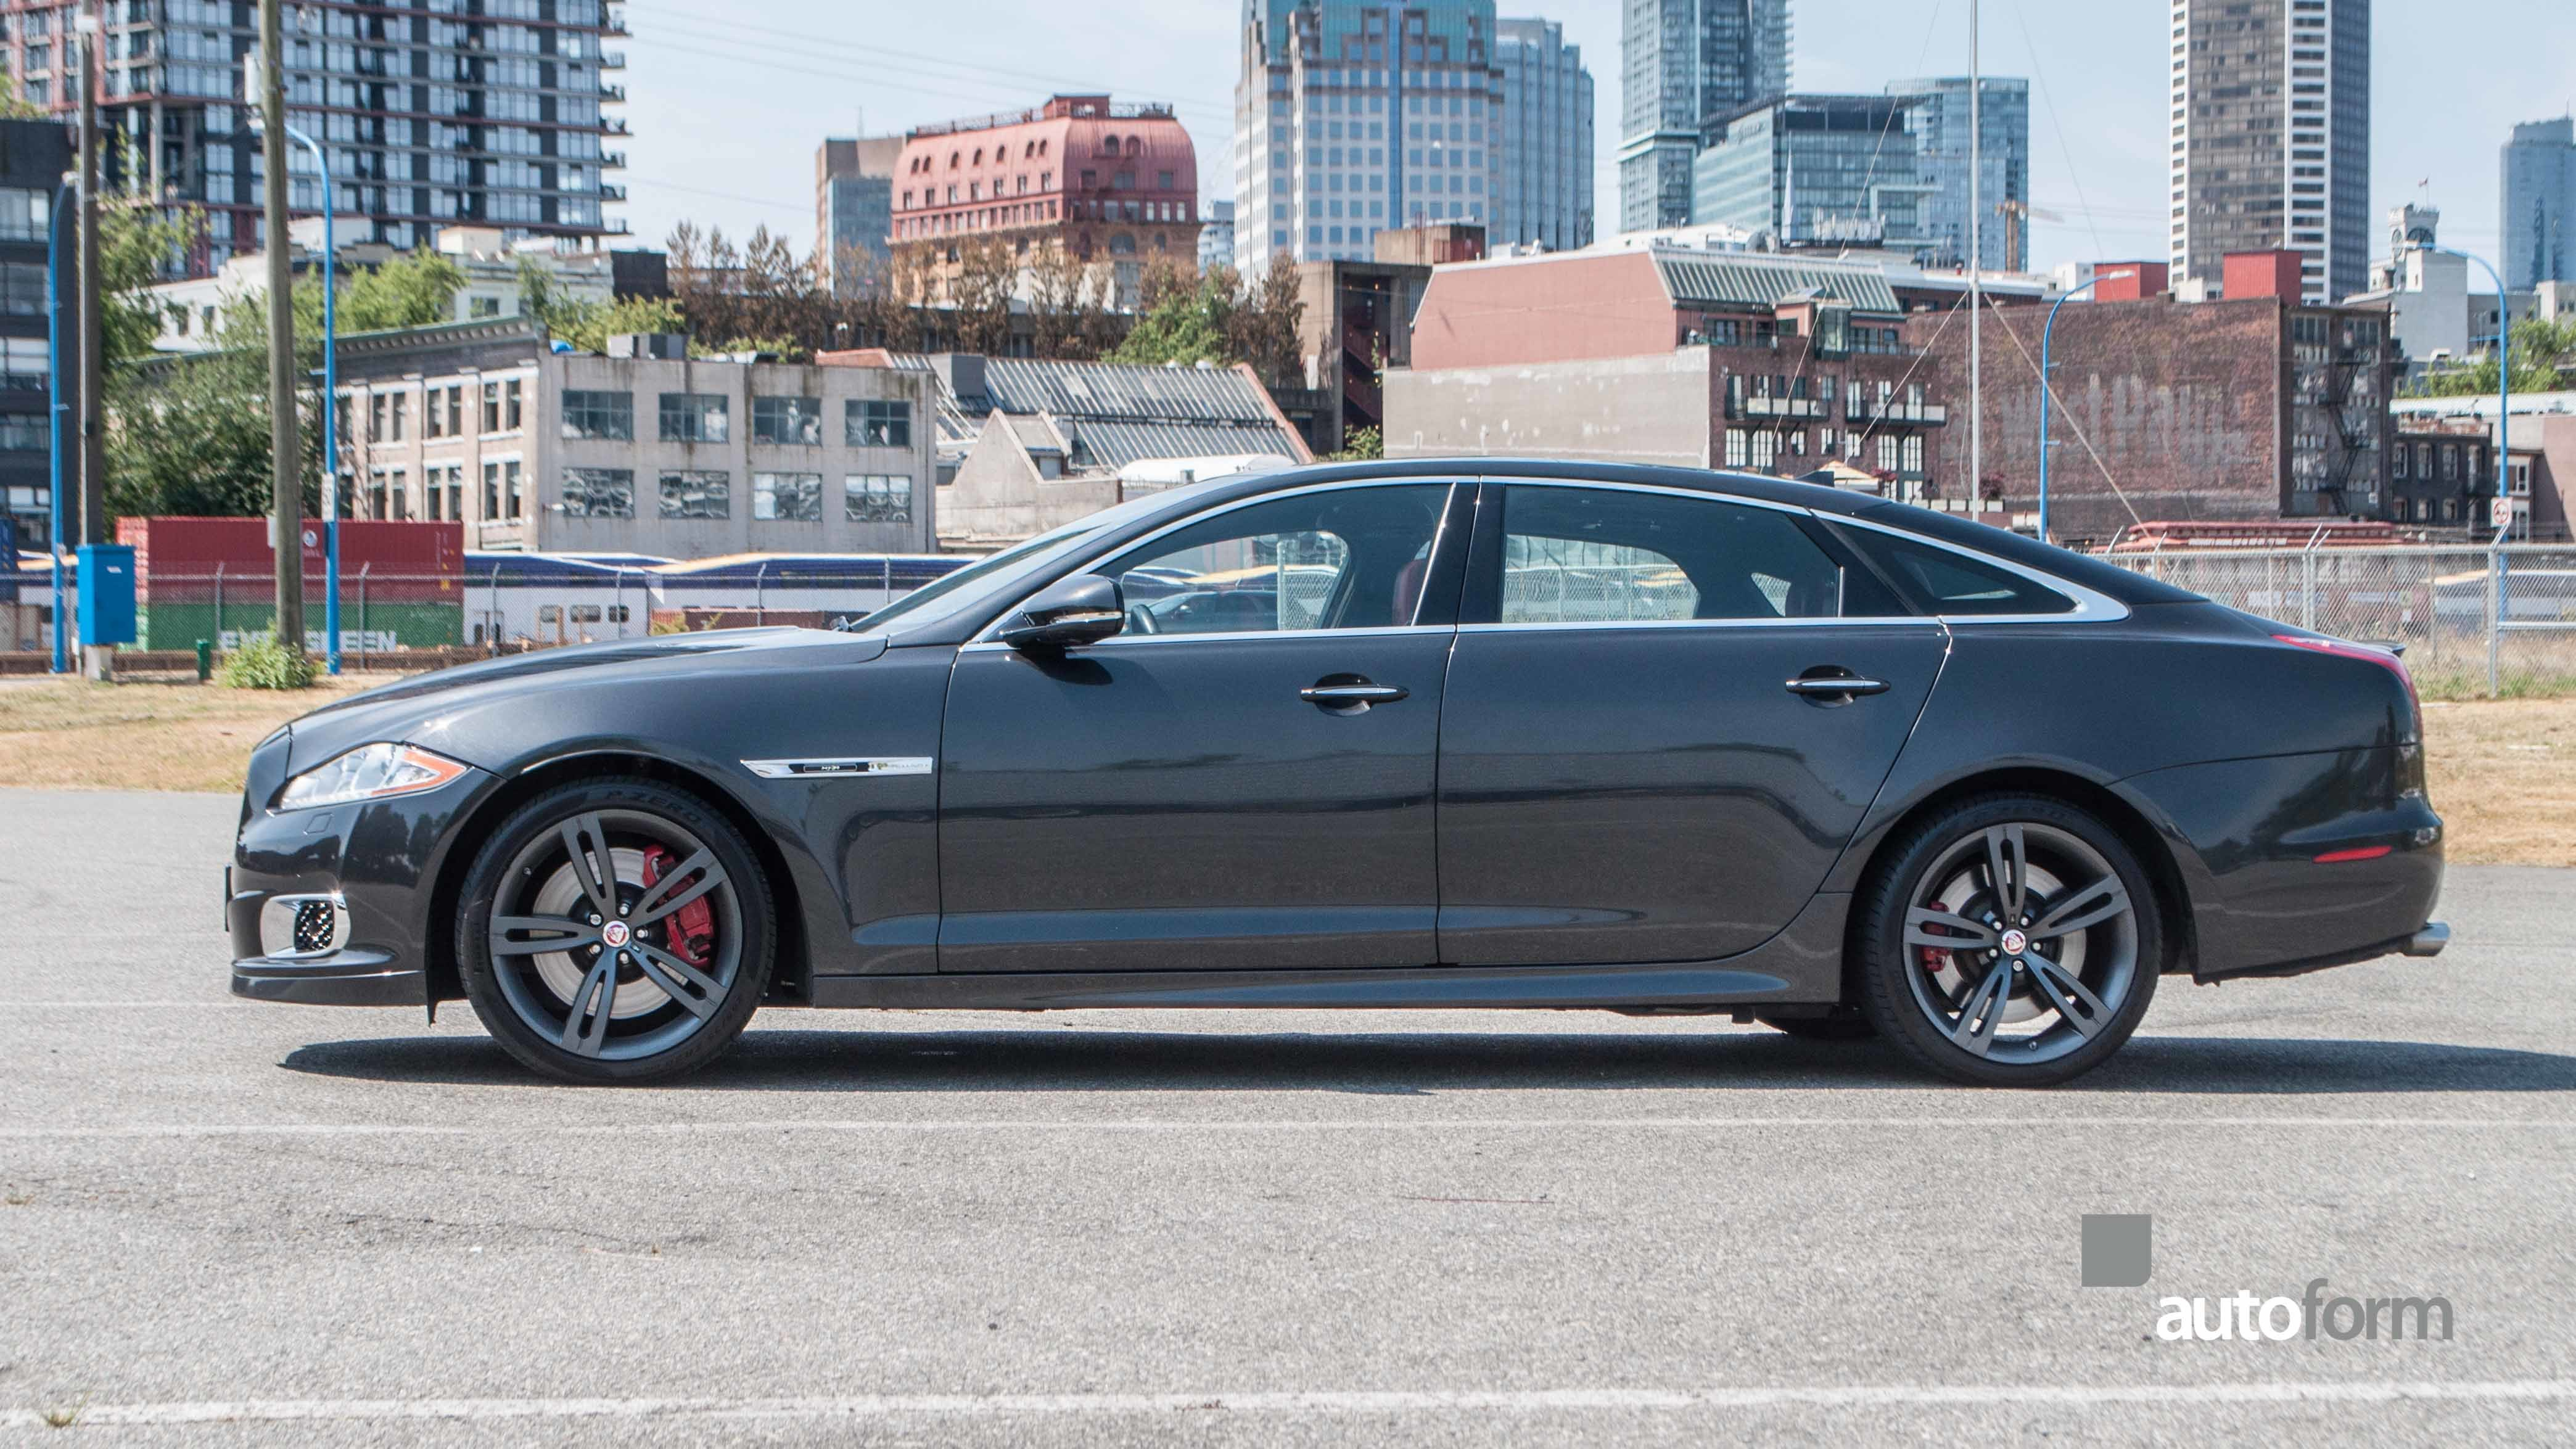 2014 Jaguar XJR 2014 Jaguar XJR 2014 Jaguar XJR ...